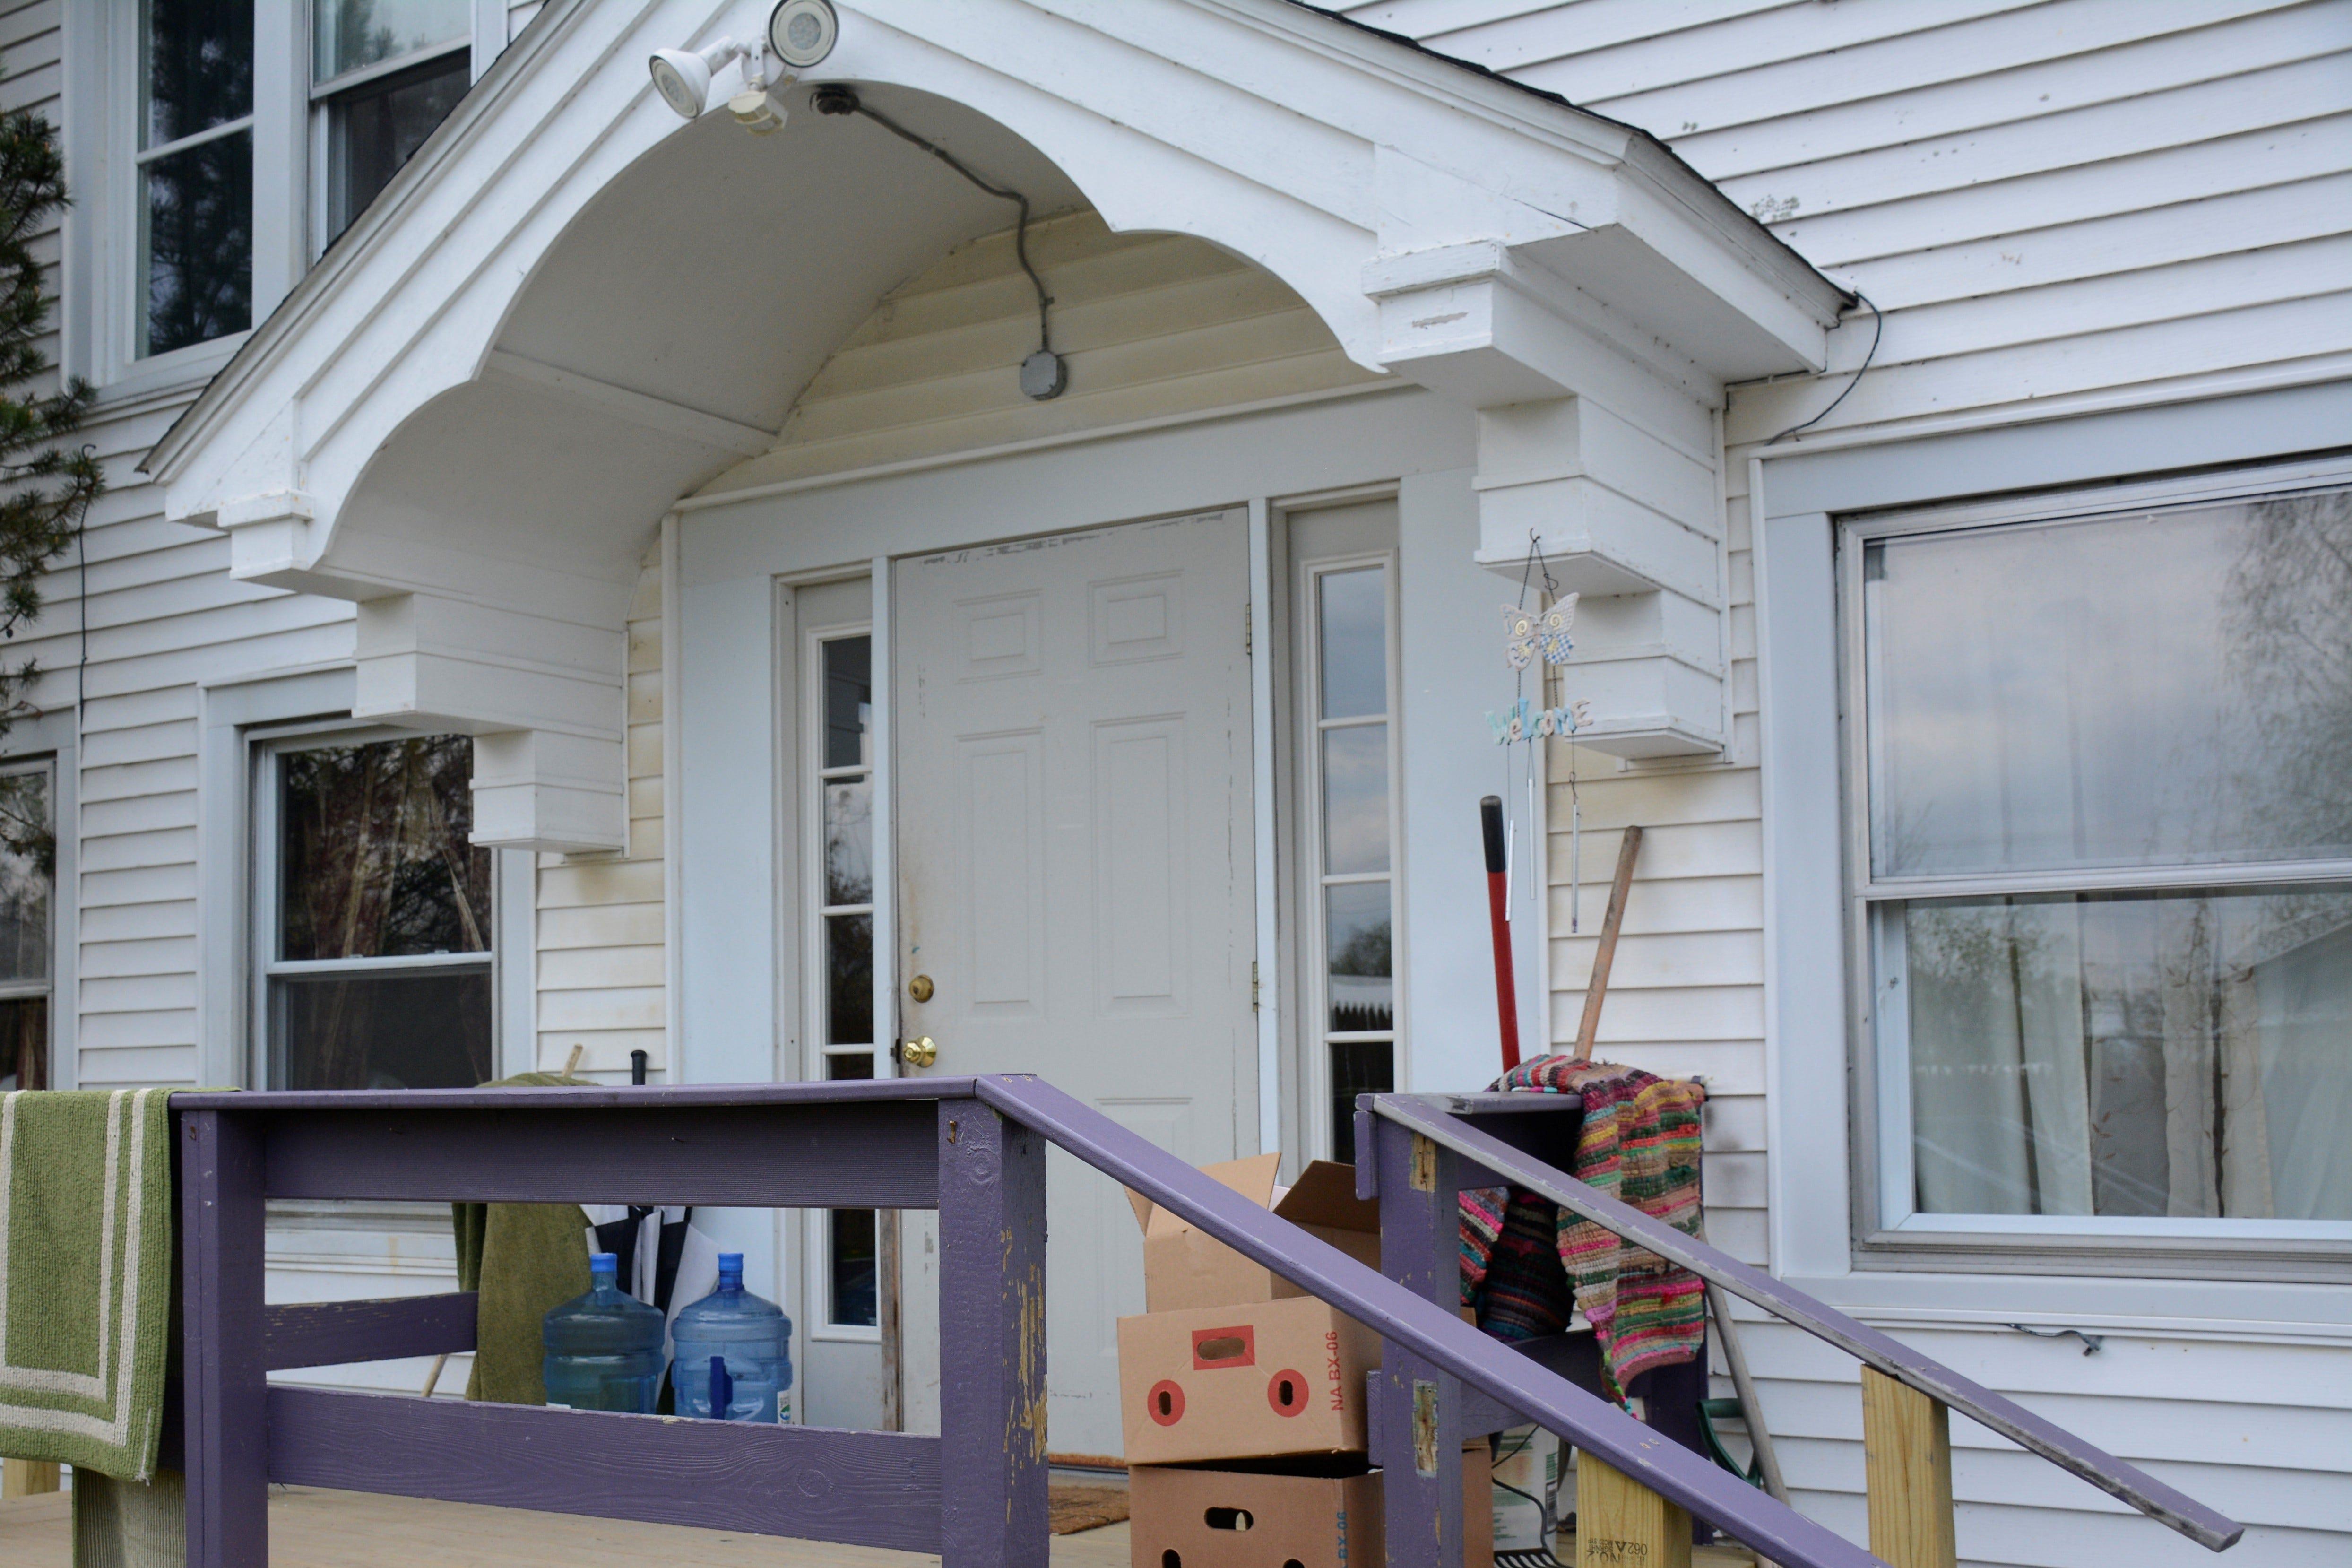 Mandala House, where Emily Welch lives